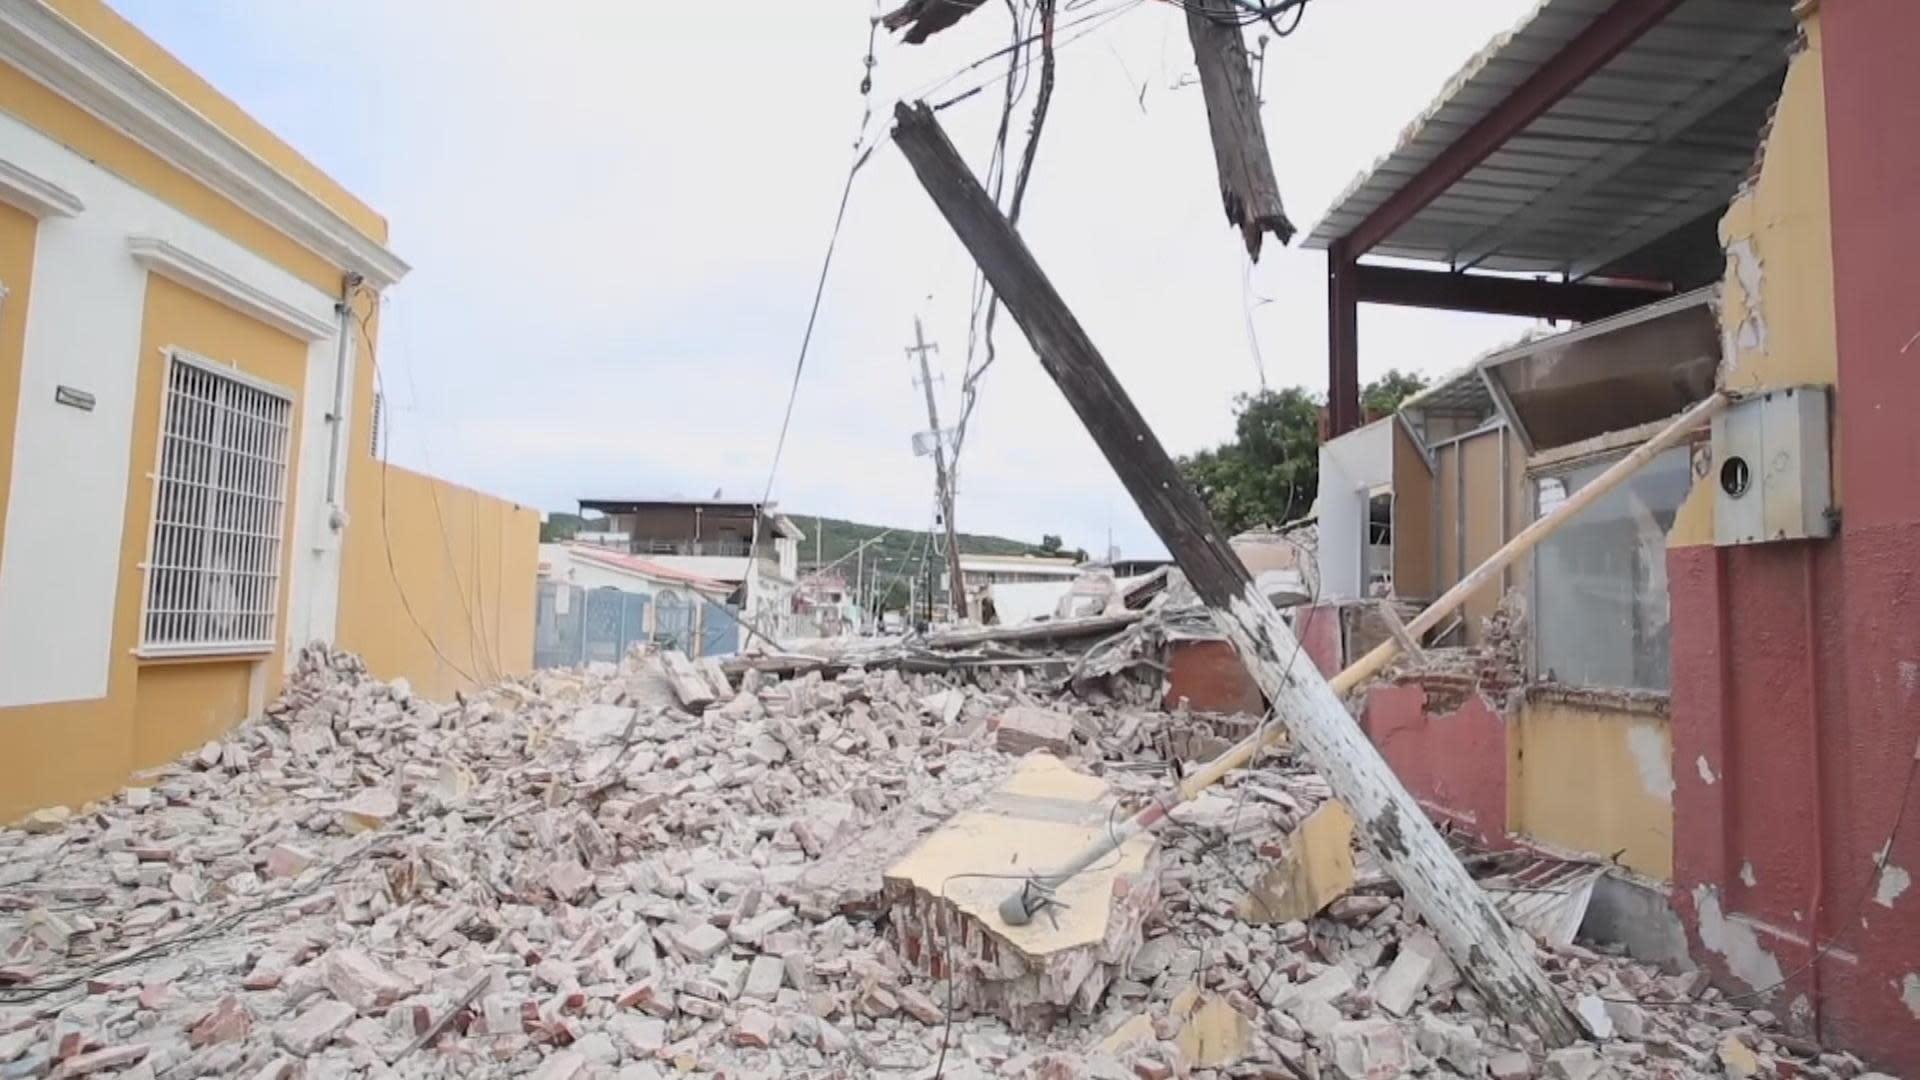 Puerto Ricans hoping Trump signs major disaster declaration